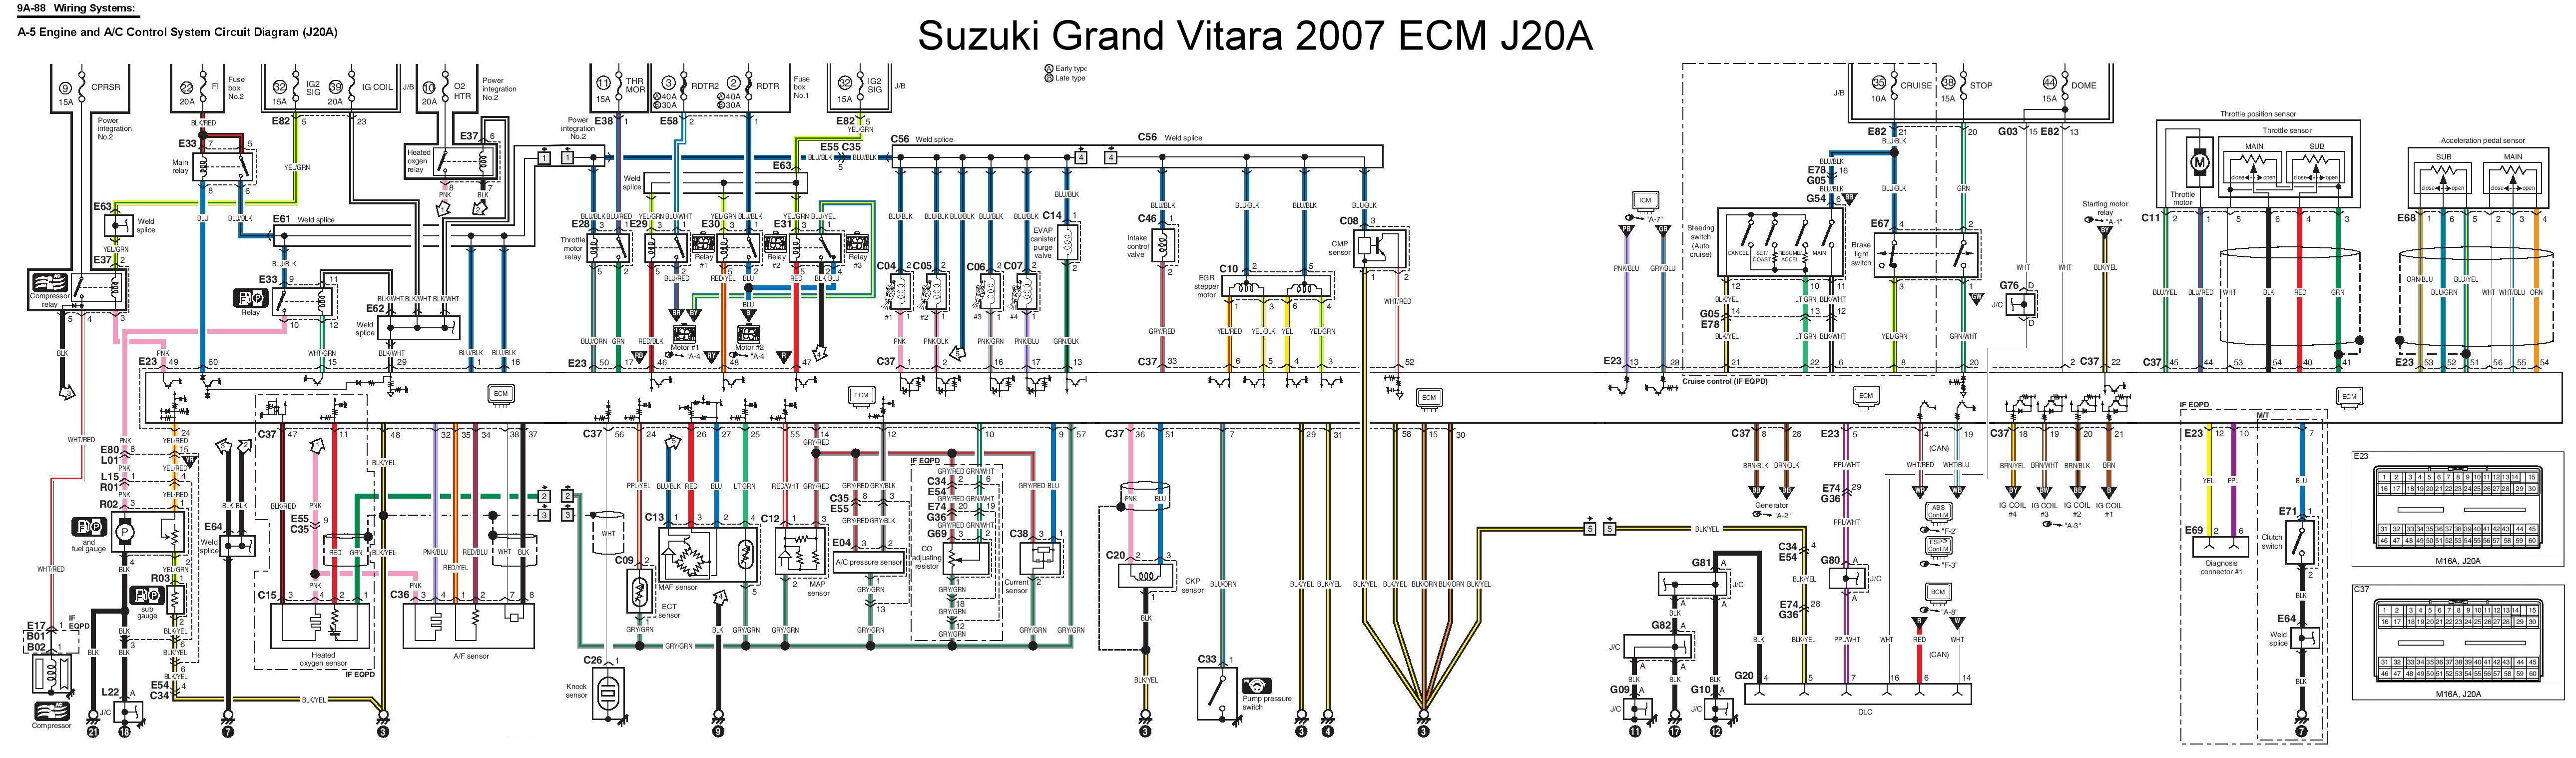 suzuki forenza 2006 fuse box